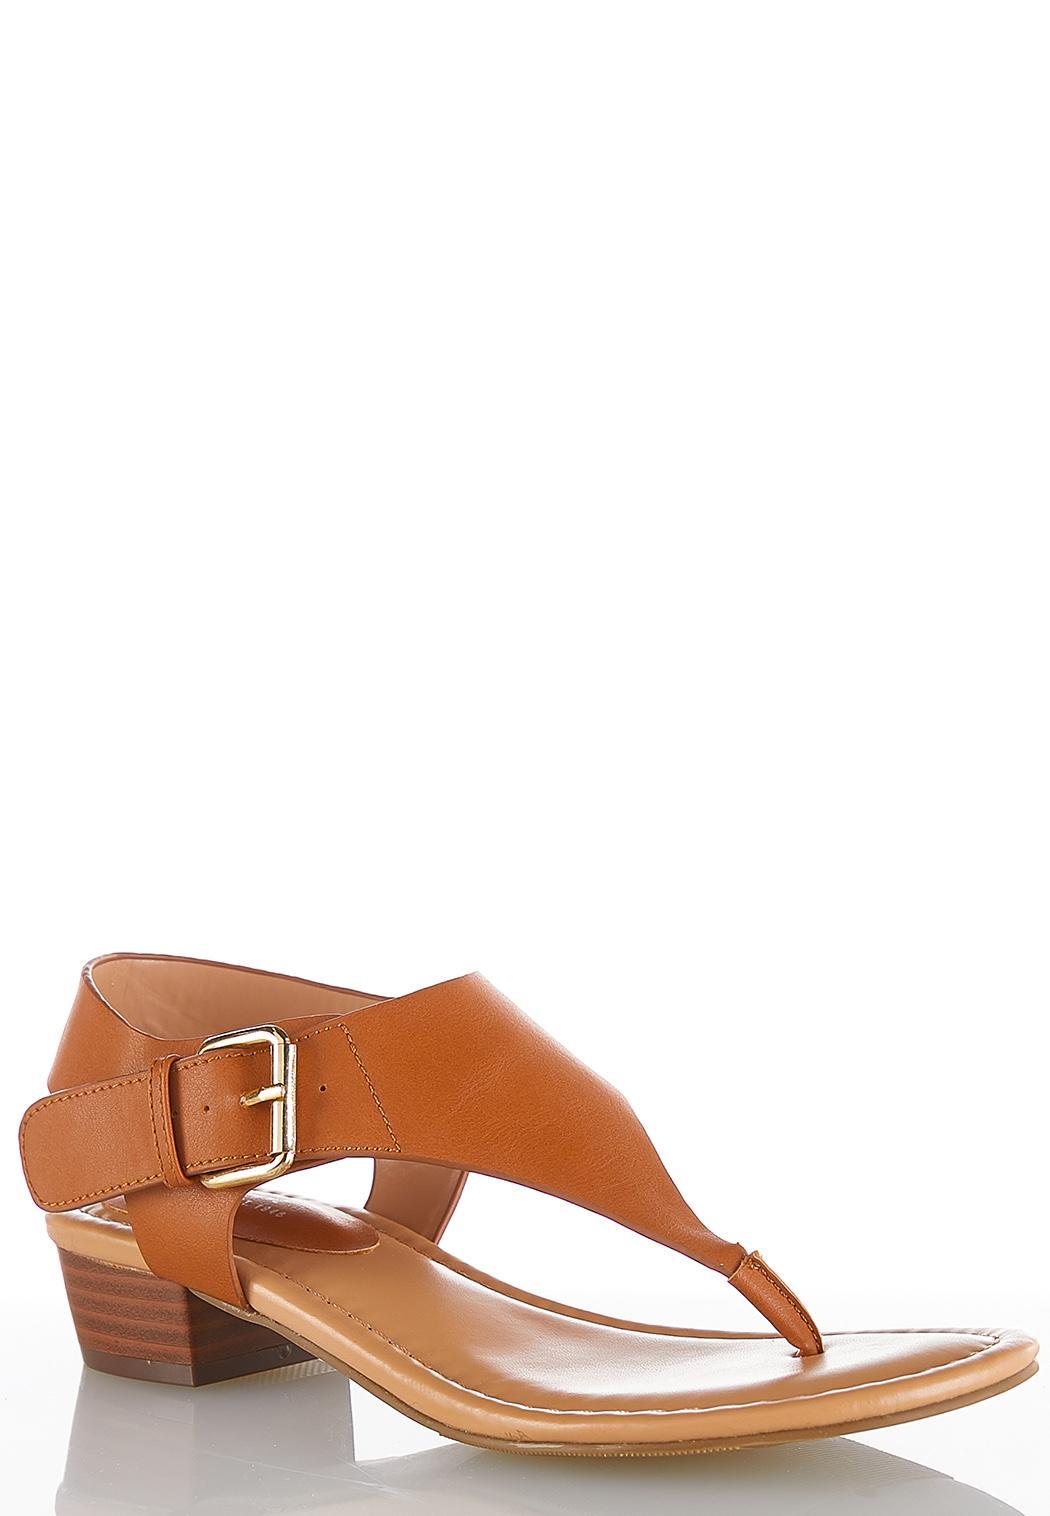 Shield Thong Heeled Sandals